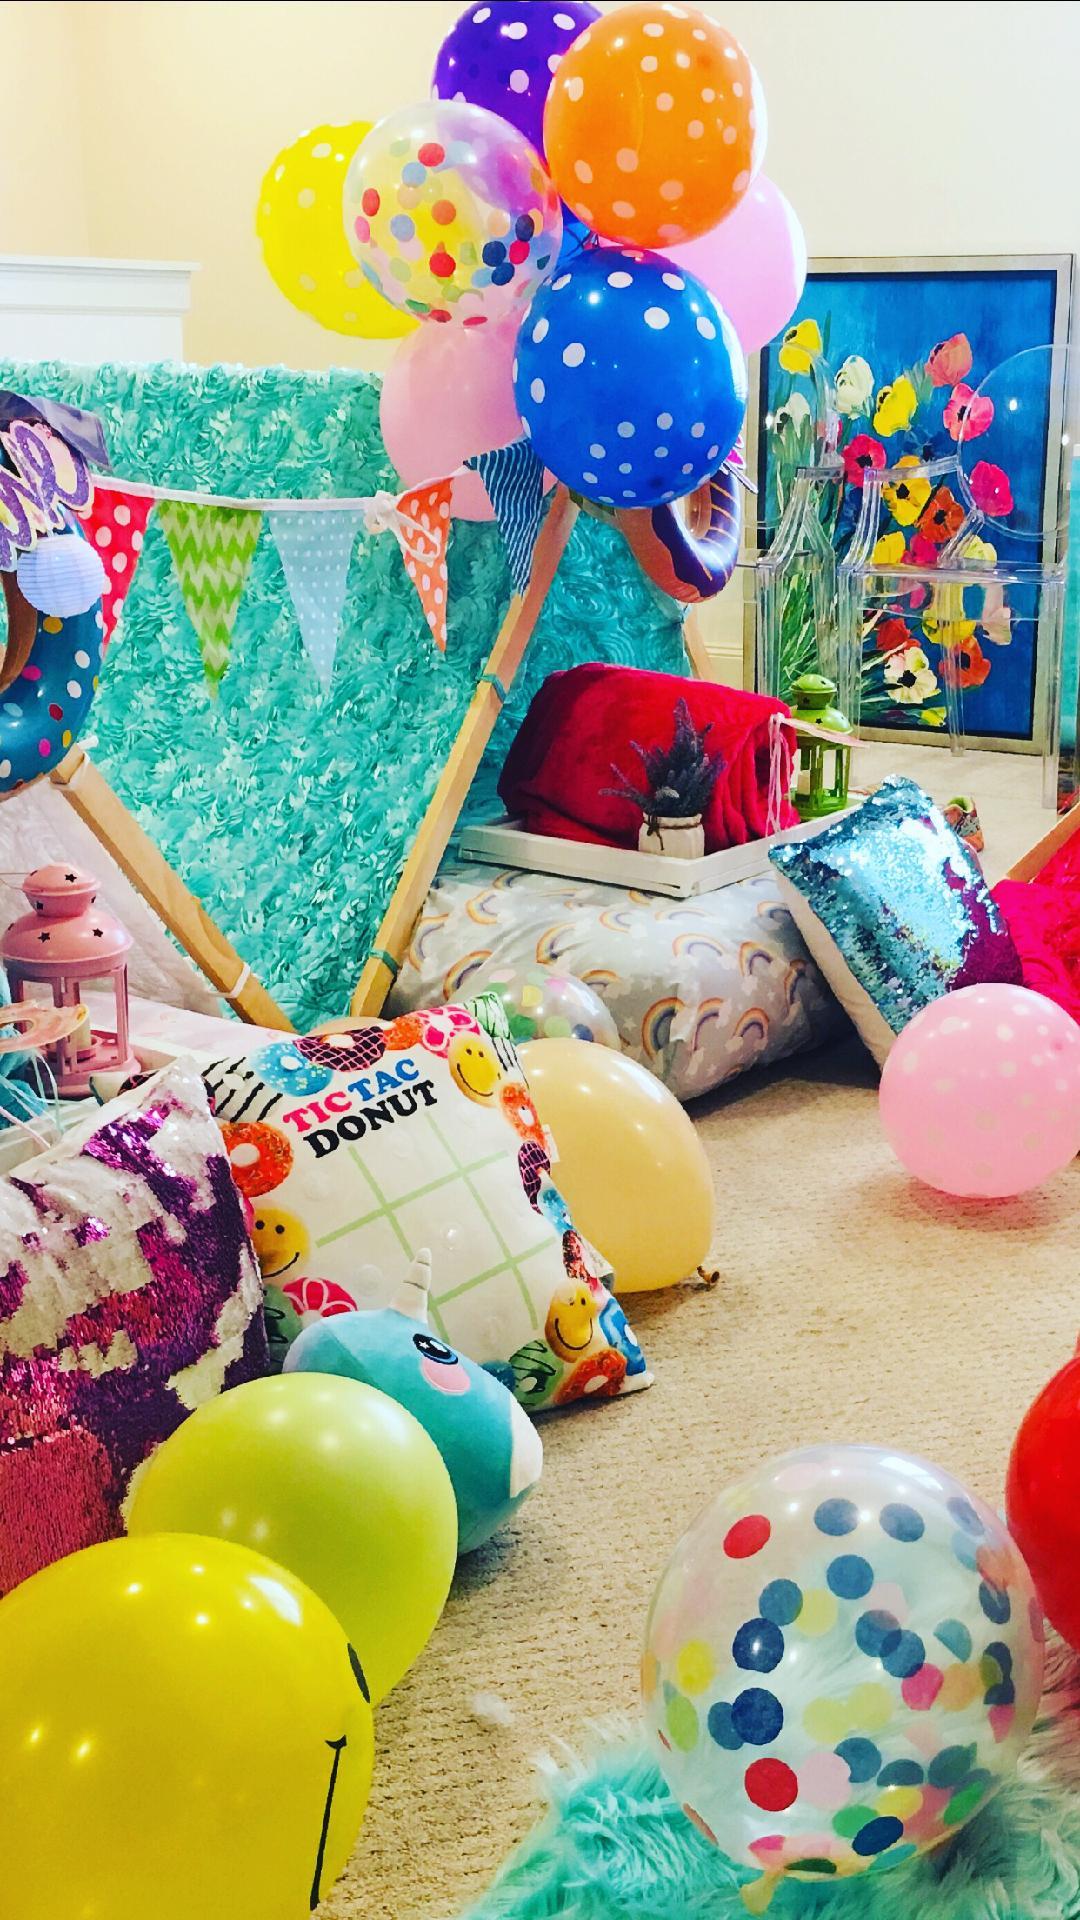 houston sleepover slumber  party tents 5.jpg